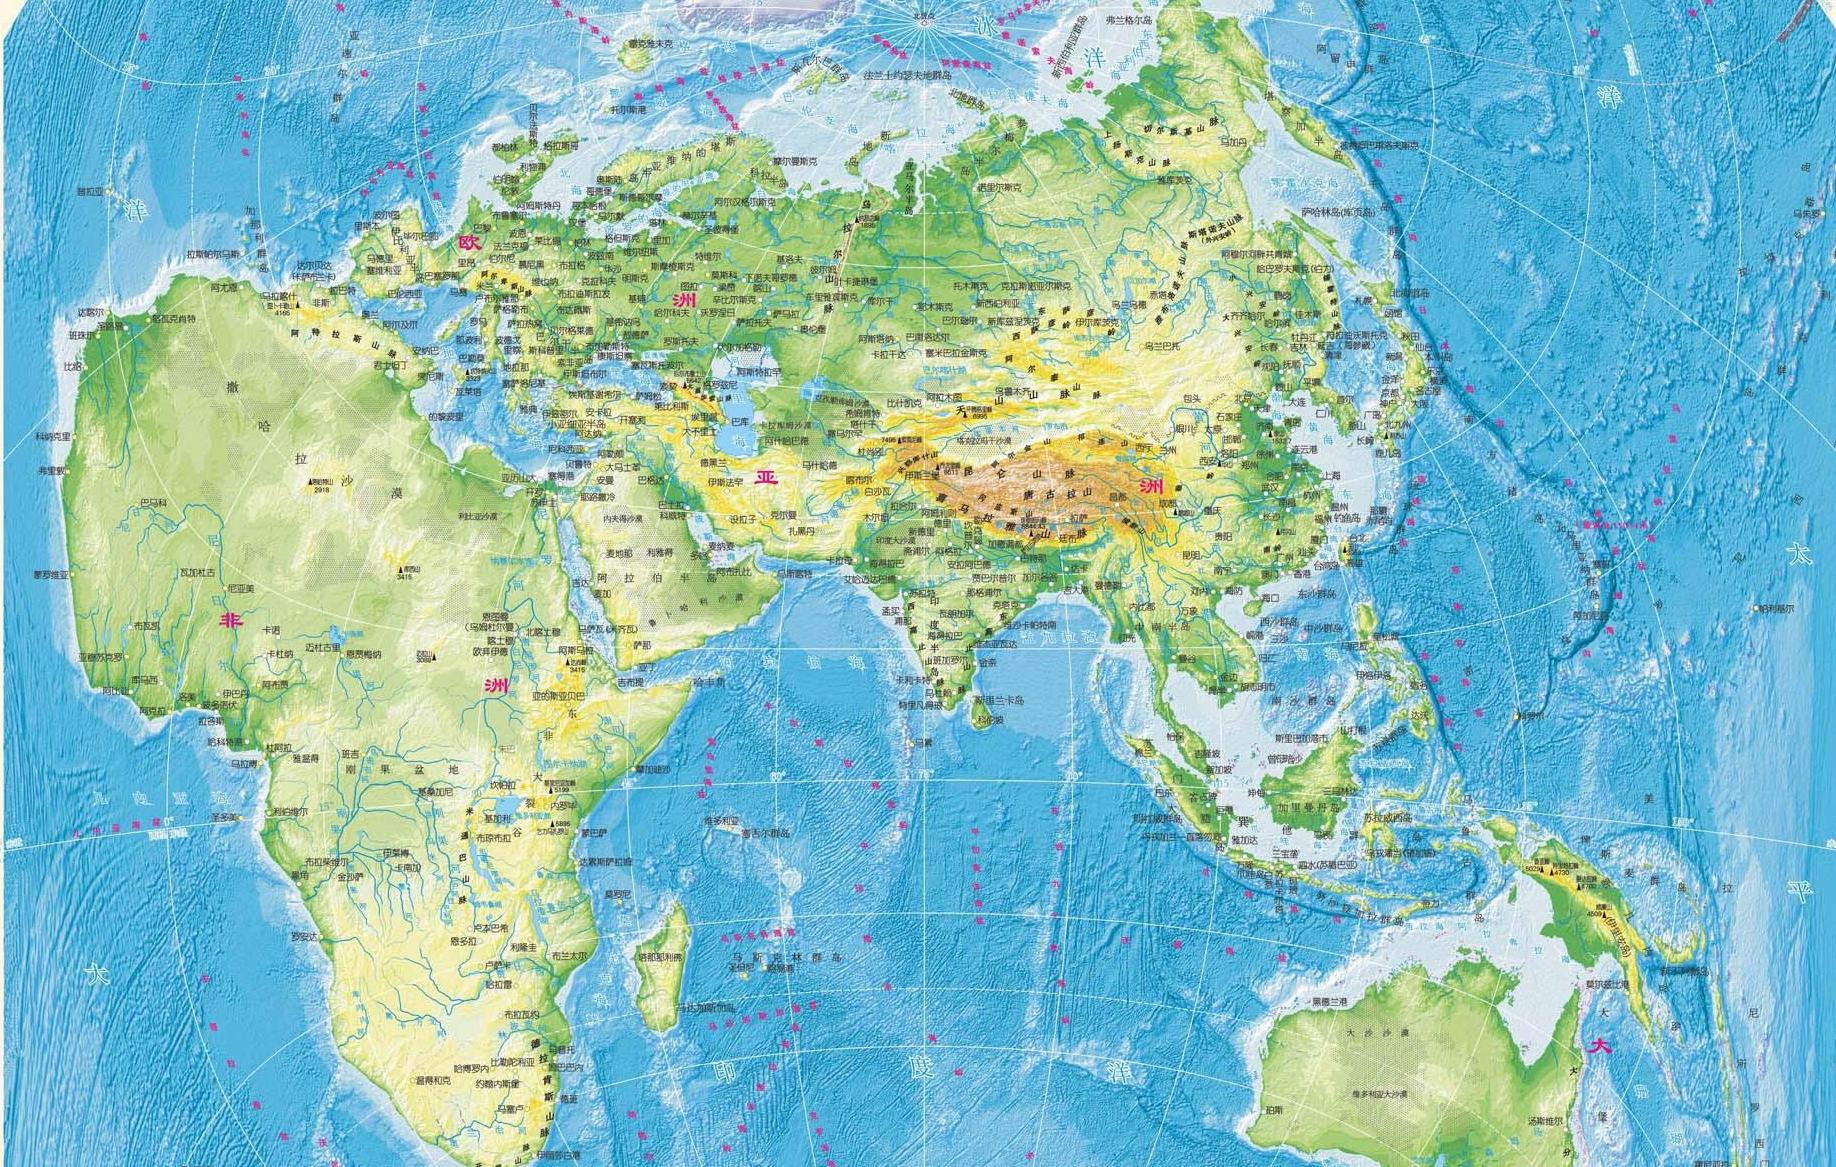 China centric map